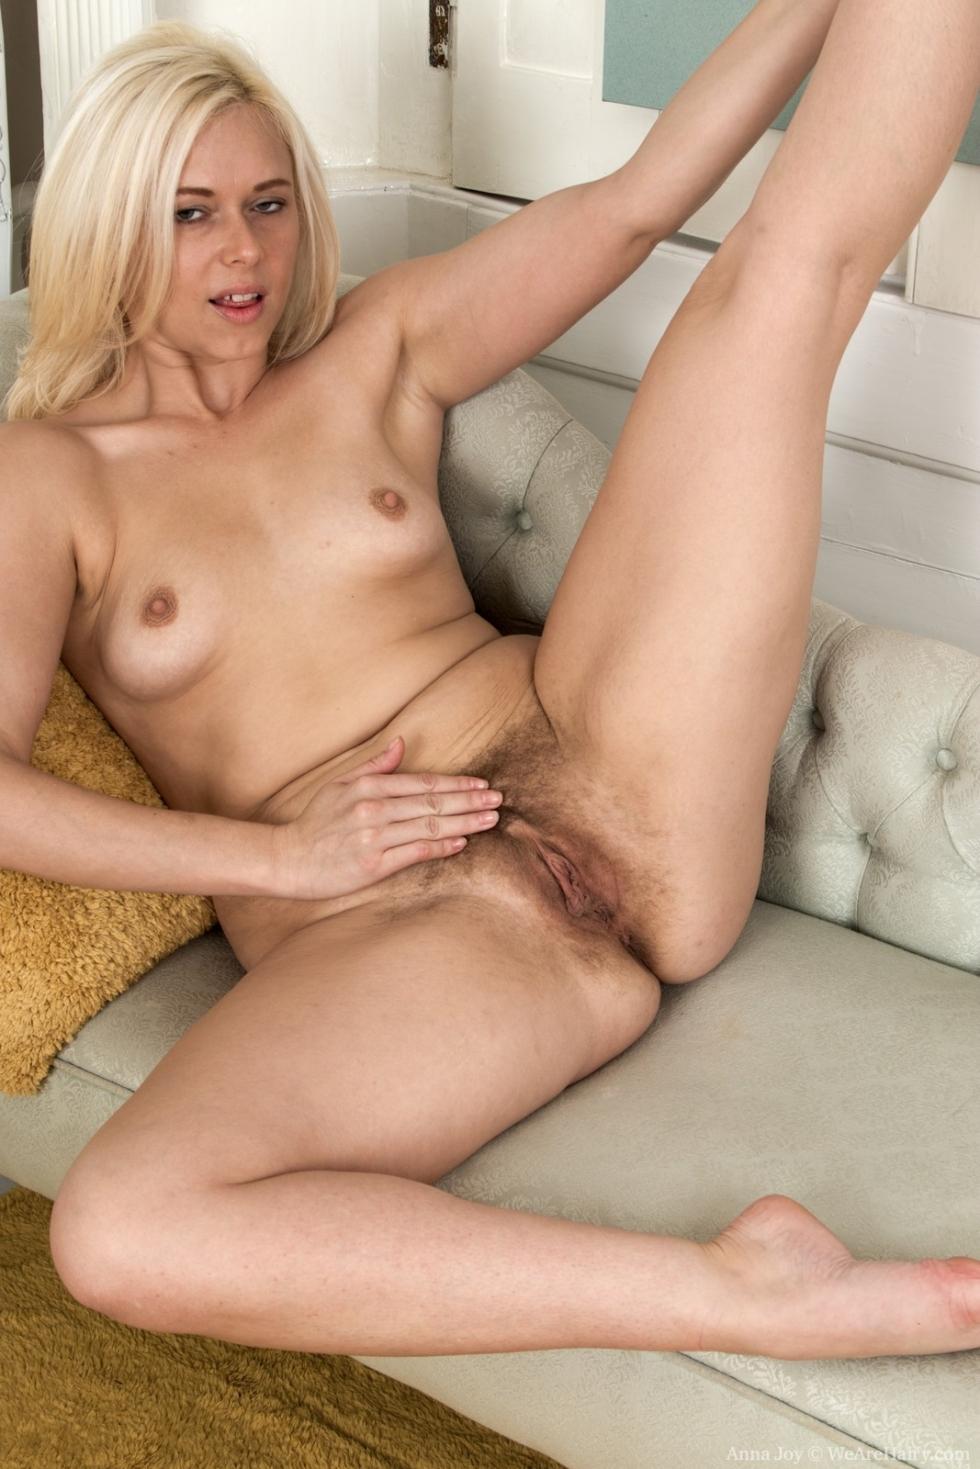 Megan hauserman porn videos